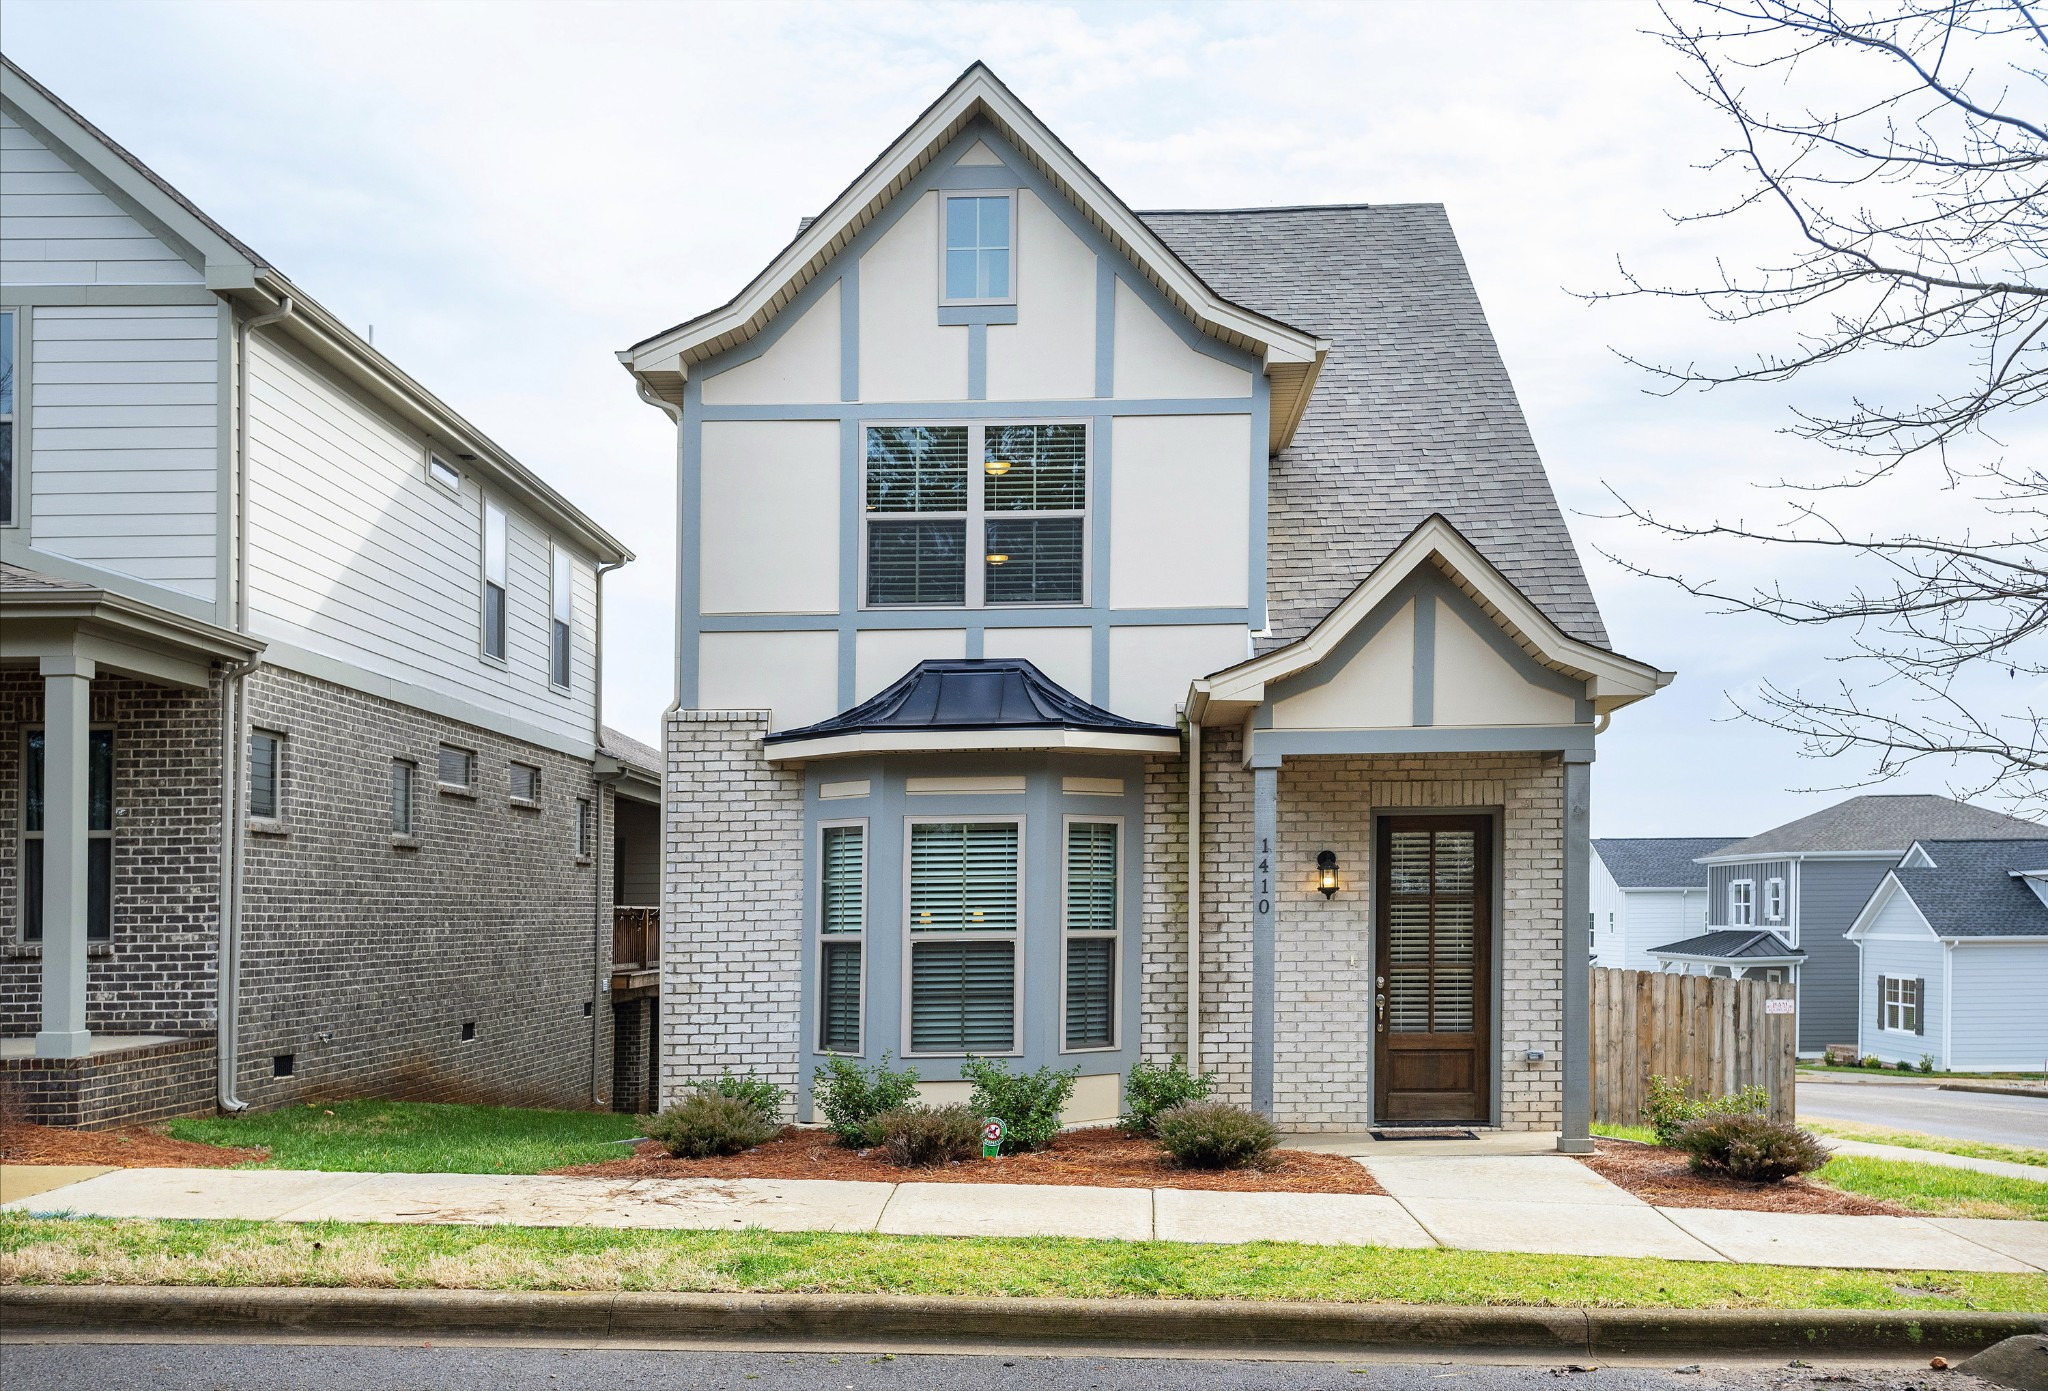 1410 Hicks Edgen Rd, Pleasant View, TN 37146 - Pleasant View, TN real estate listing